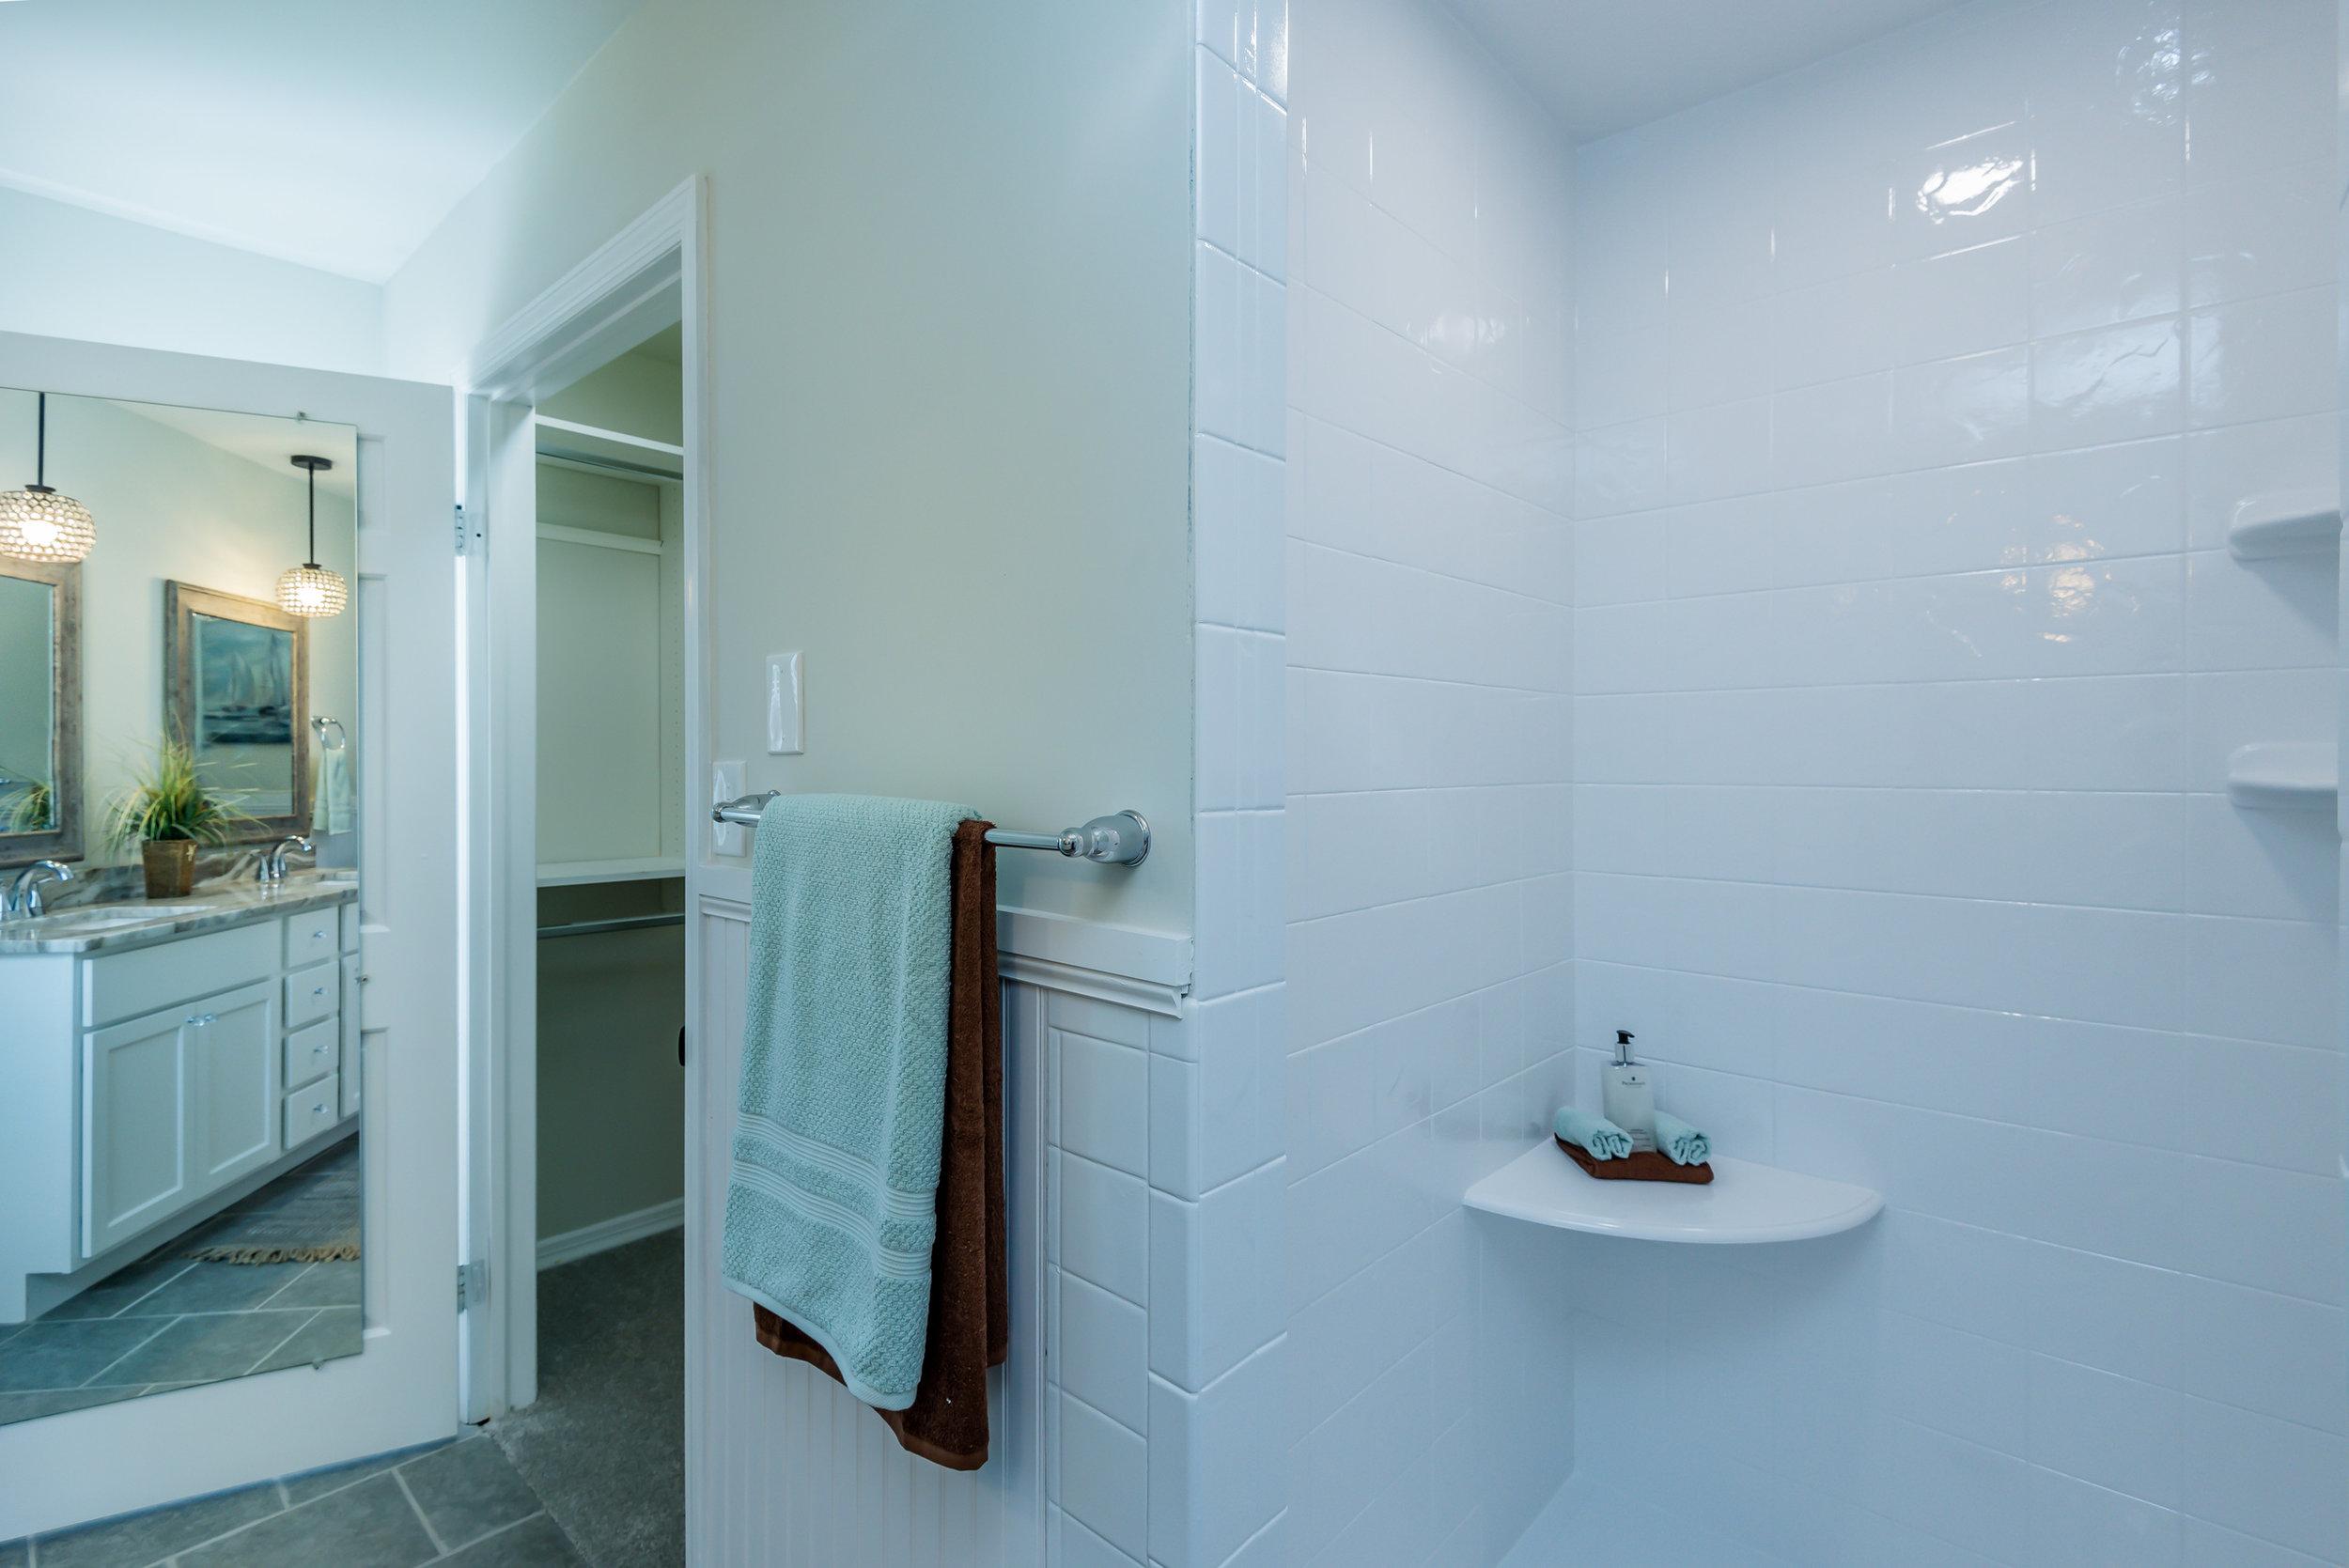 room_5_bath_1_of_1_-3.jpg